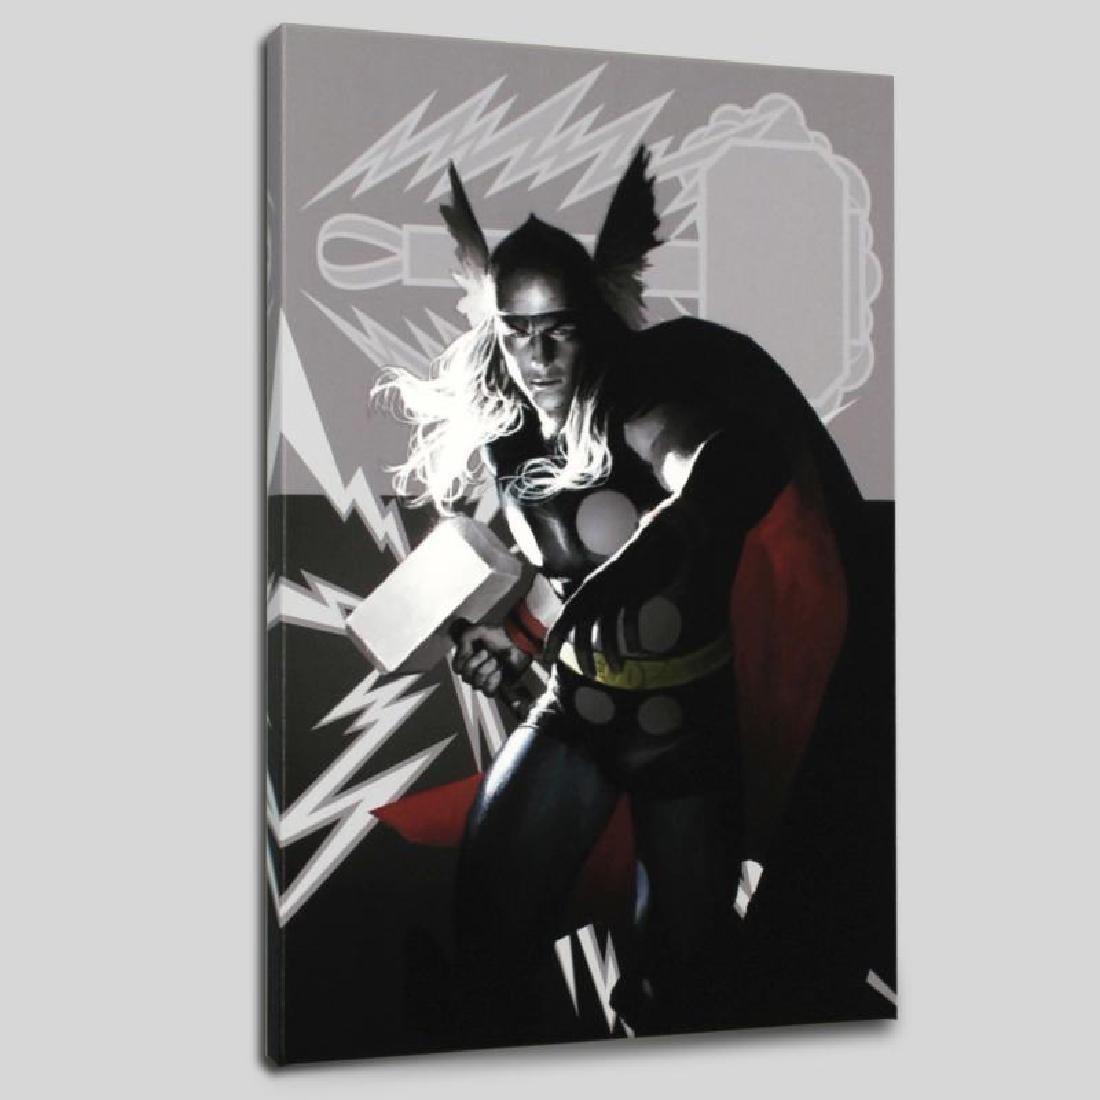 """Wolverine Avengers Origins: Thor #1 & The X-Men #2"" - 2"